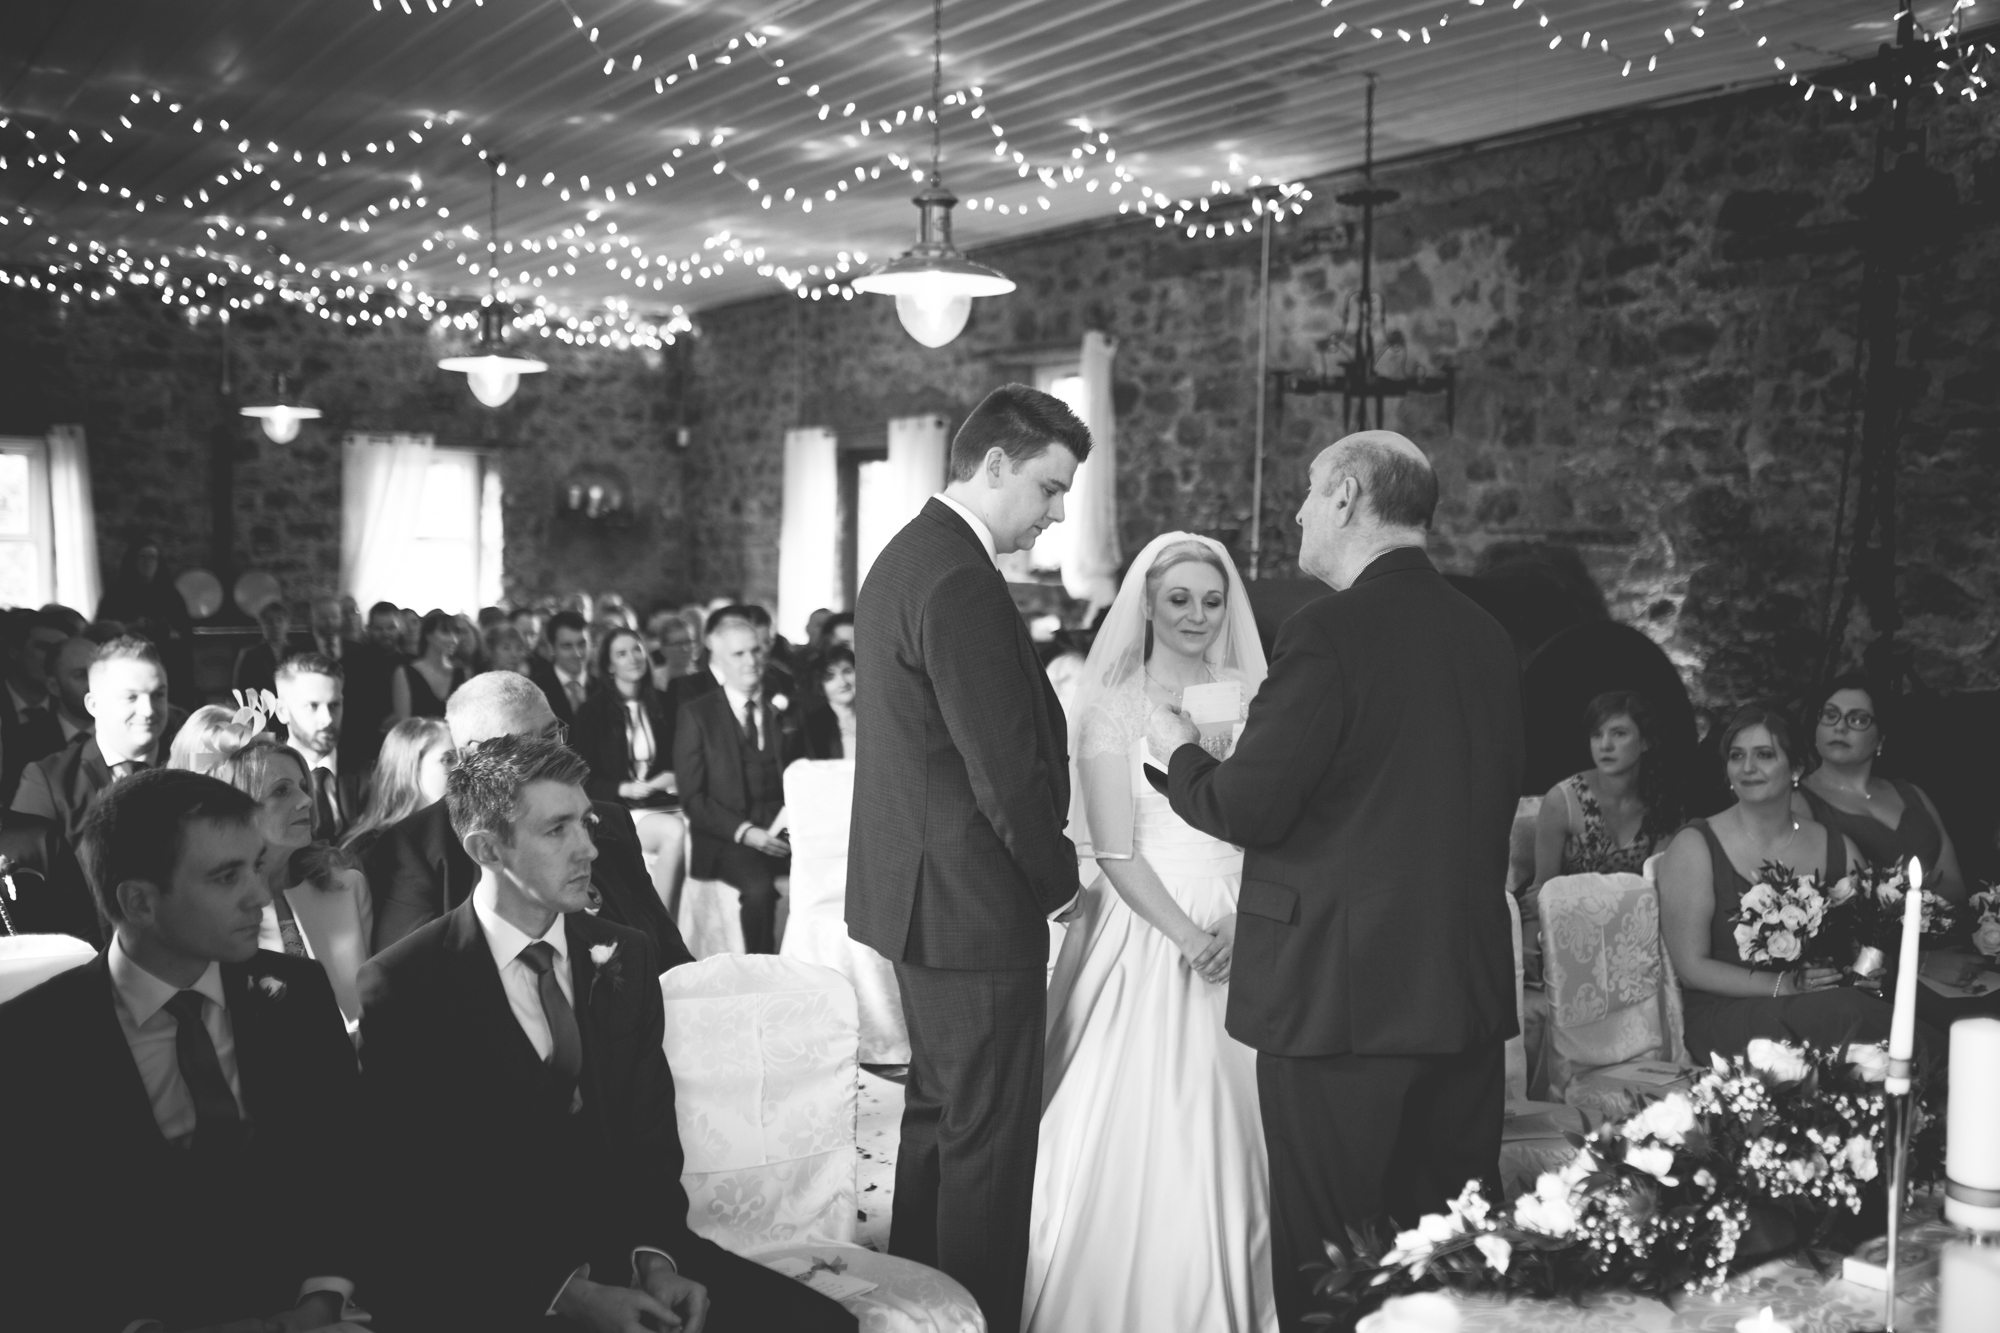 Steve_Emma_Ceremony-76.jpg